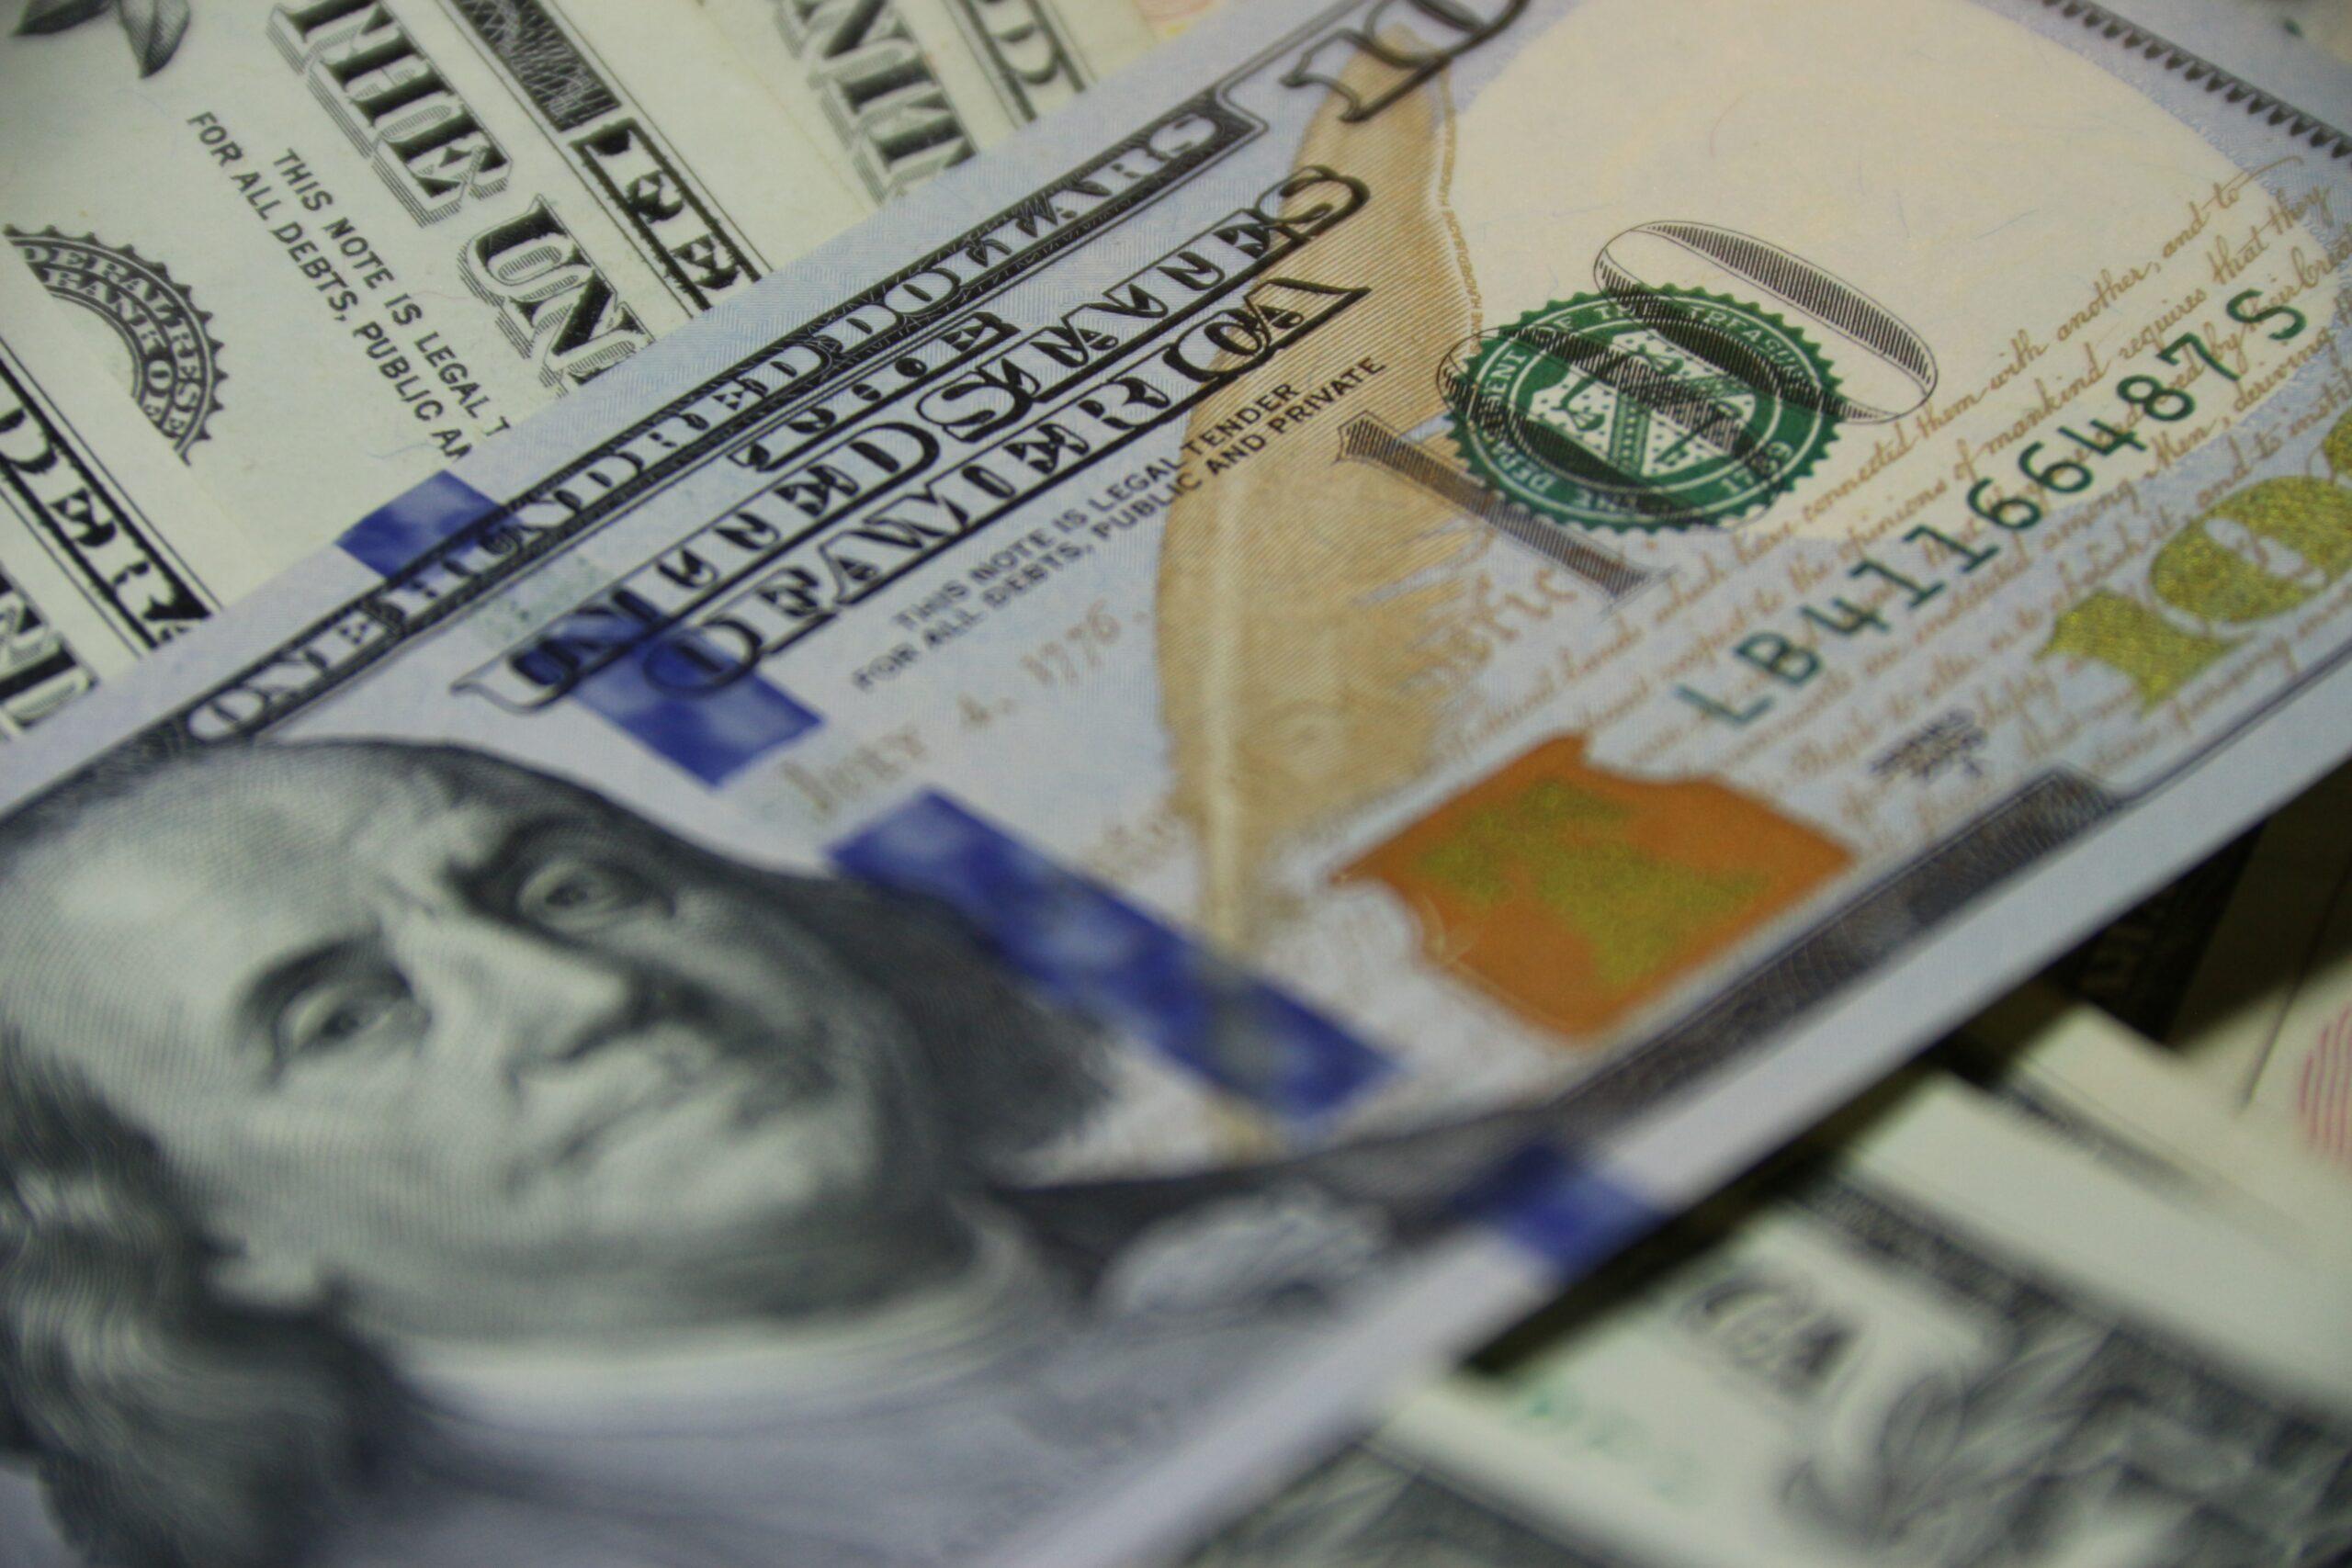 The United States Dollar